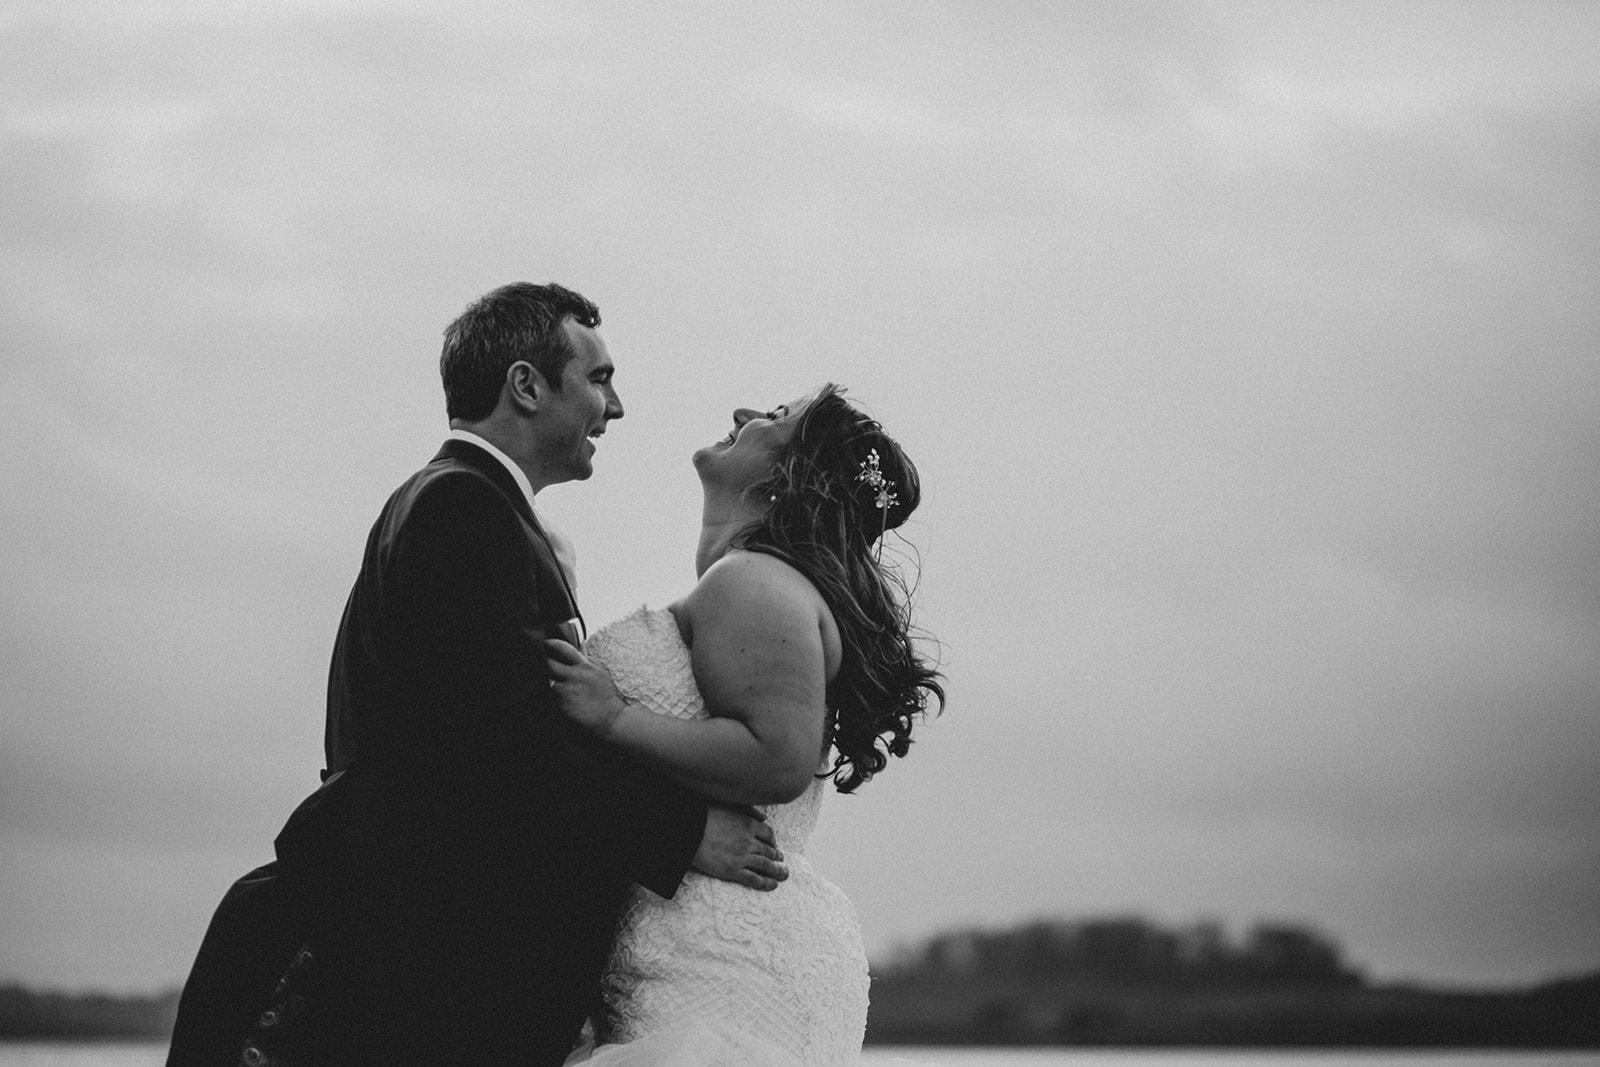 rutland wedding - fun wedding - east midlands wedding planner - Leicestershire wedding planning - nottingham wedding planning - romantic wedding photo - bride and groom photography